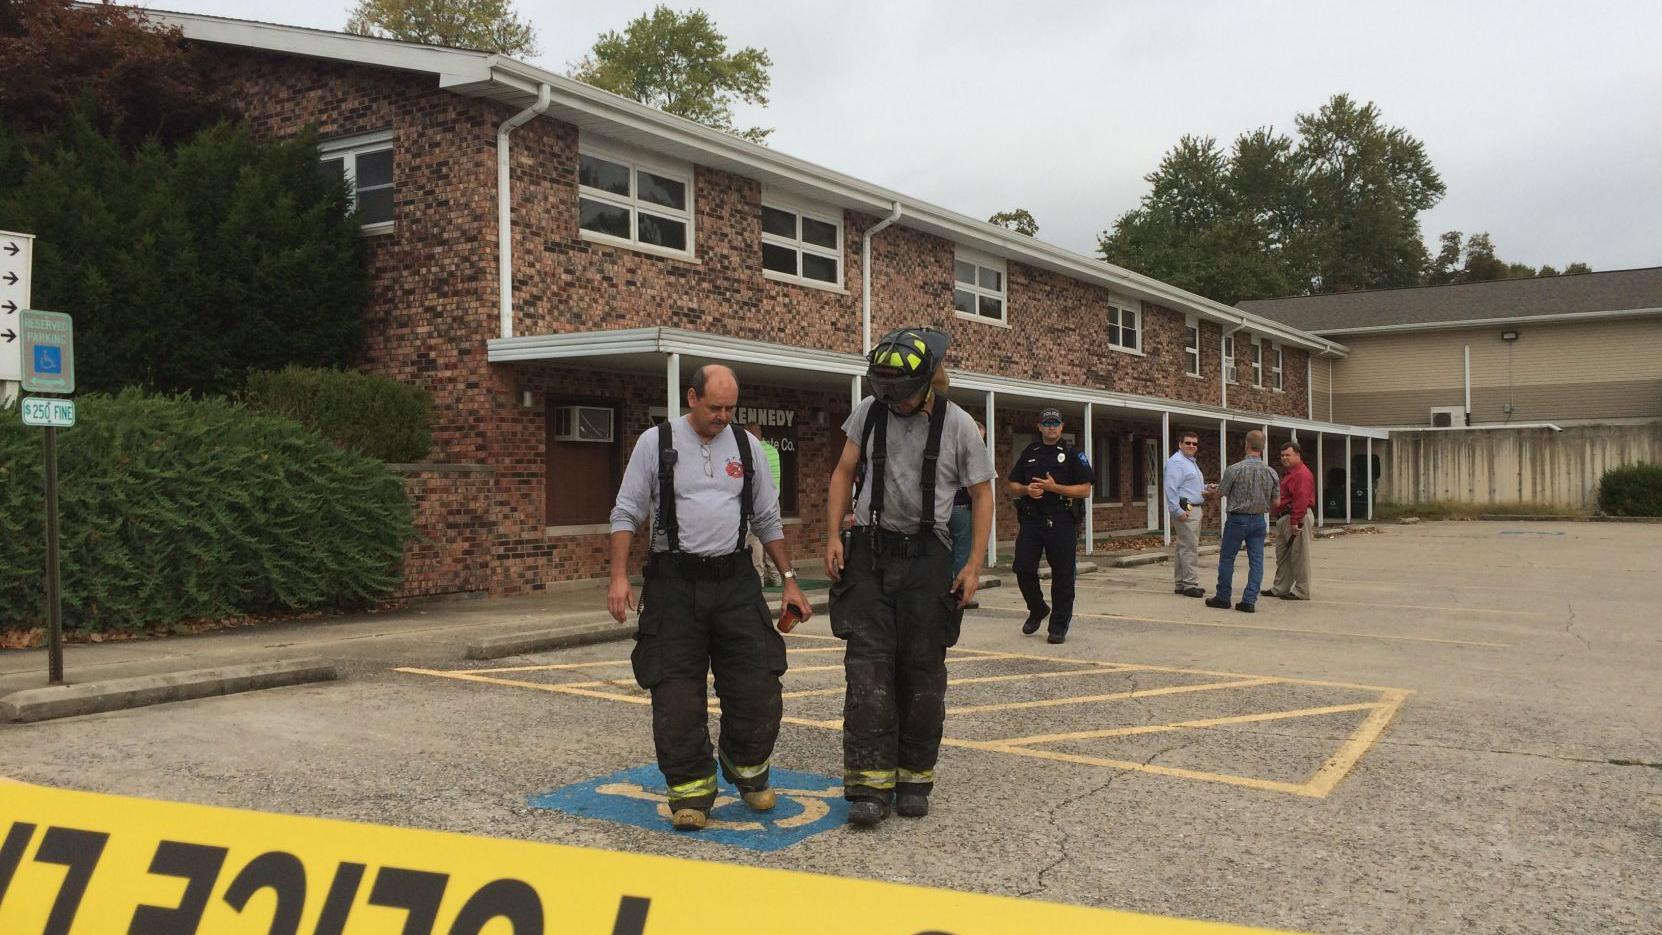 Spokeswoman Murphysboro Dhs Fire Considered Suspicious